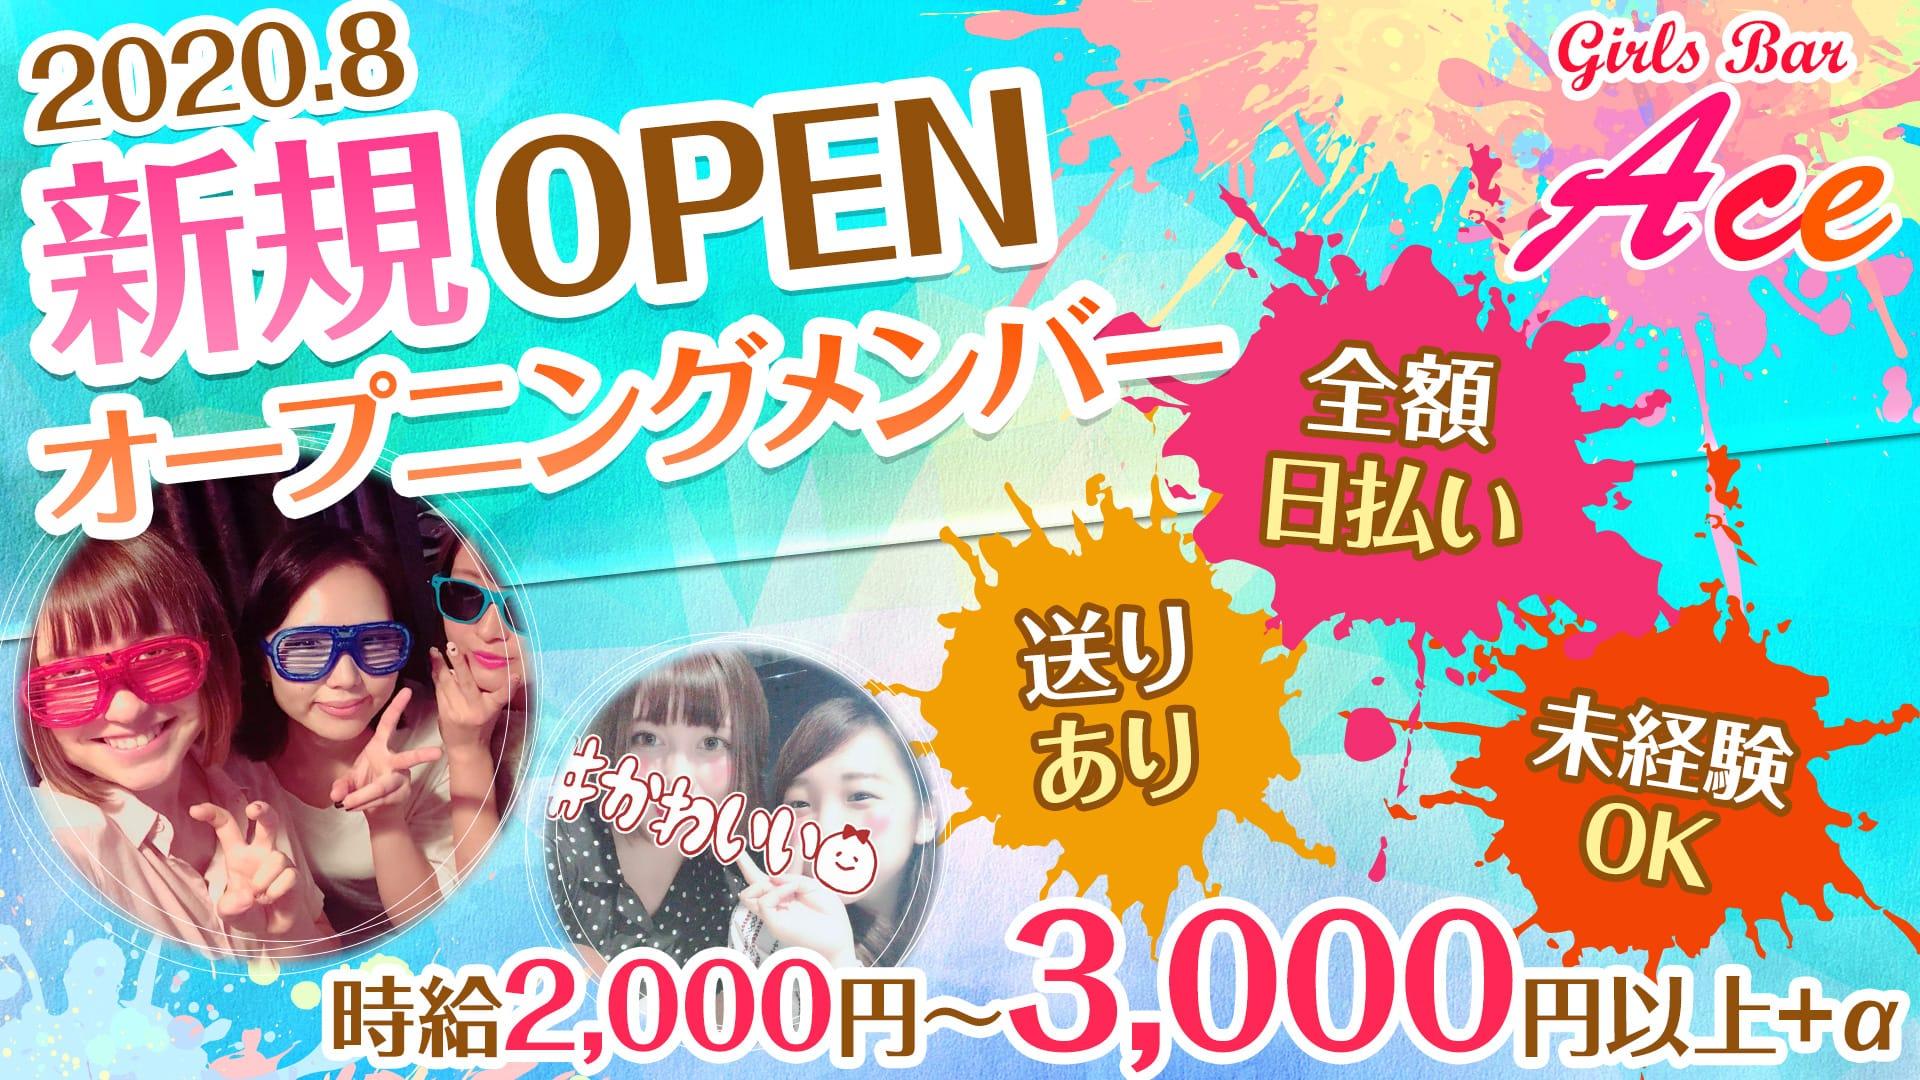 Girls Bar Ace(エース) 横浜ガールズバー TOP画像